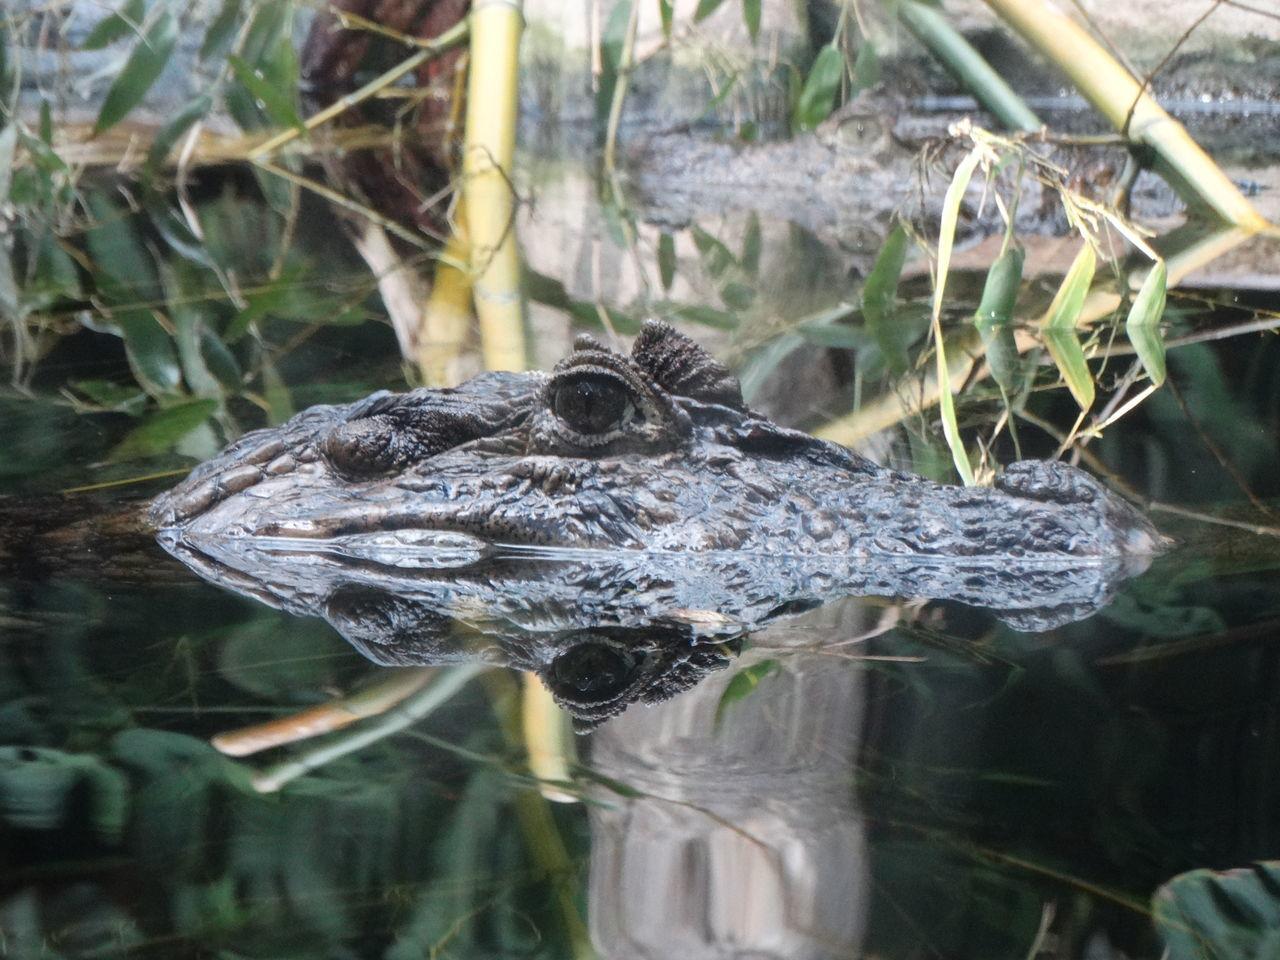 Kaiman Close-up Funny Faces Abhängen Relax Zoo Aligator Mirror Reflection Mirror Effect Mirror Picture Spiegelung Wasser